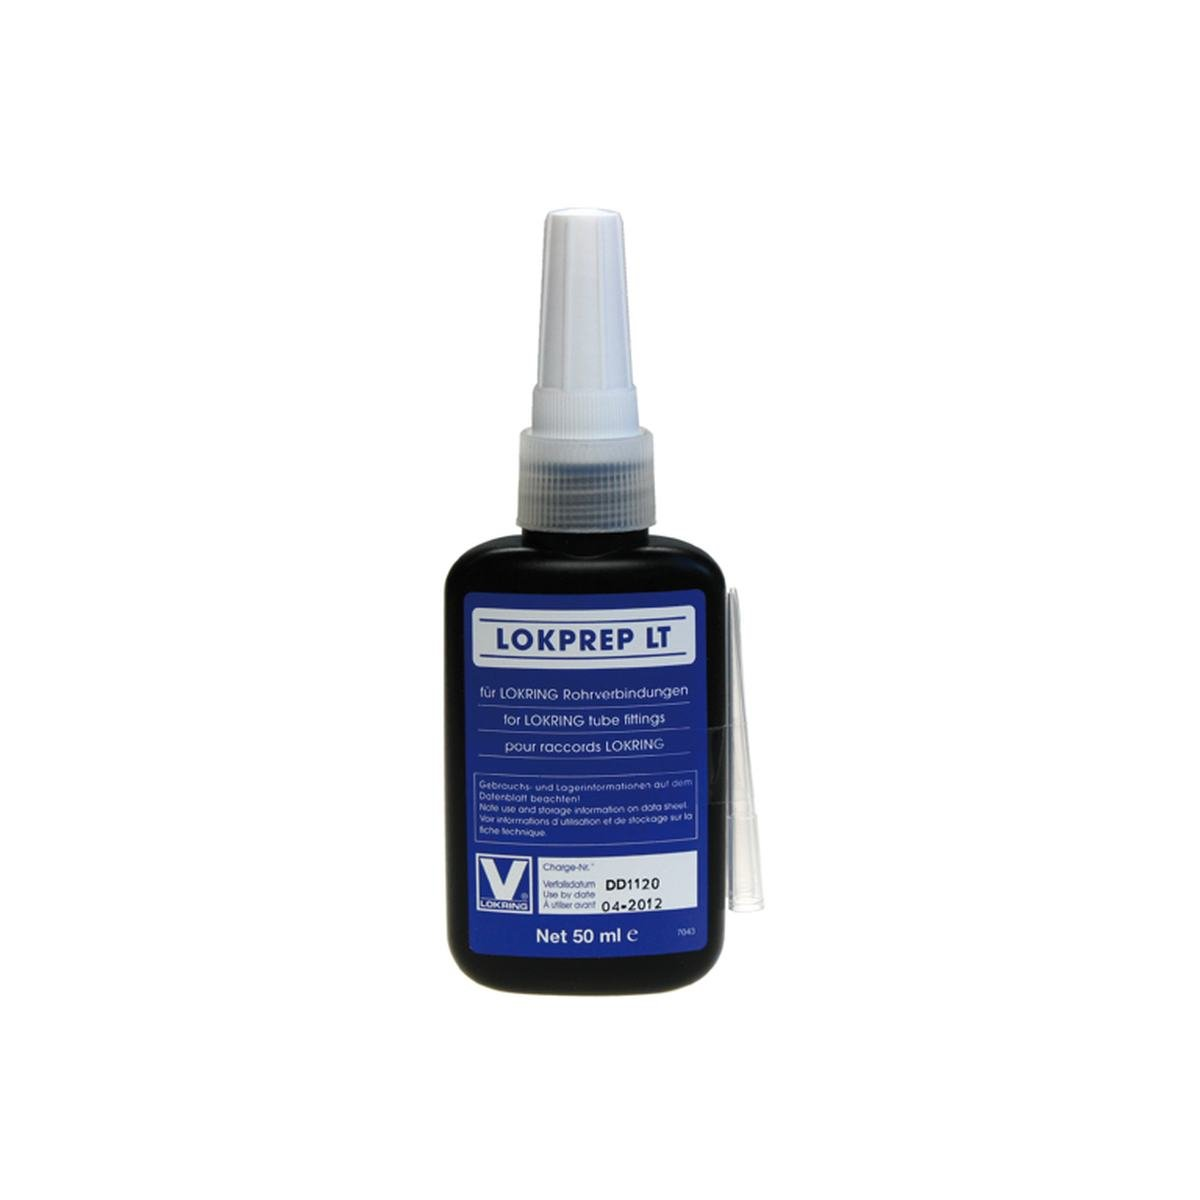 Lokprep LT - 50 ml. i flaske